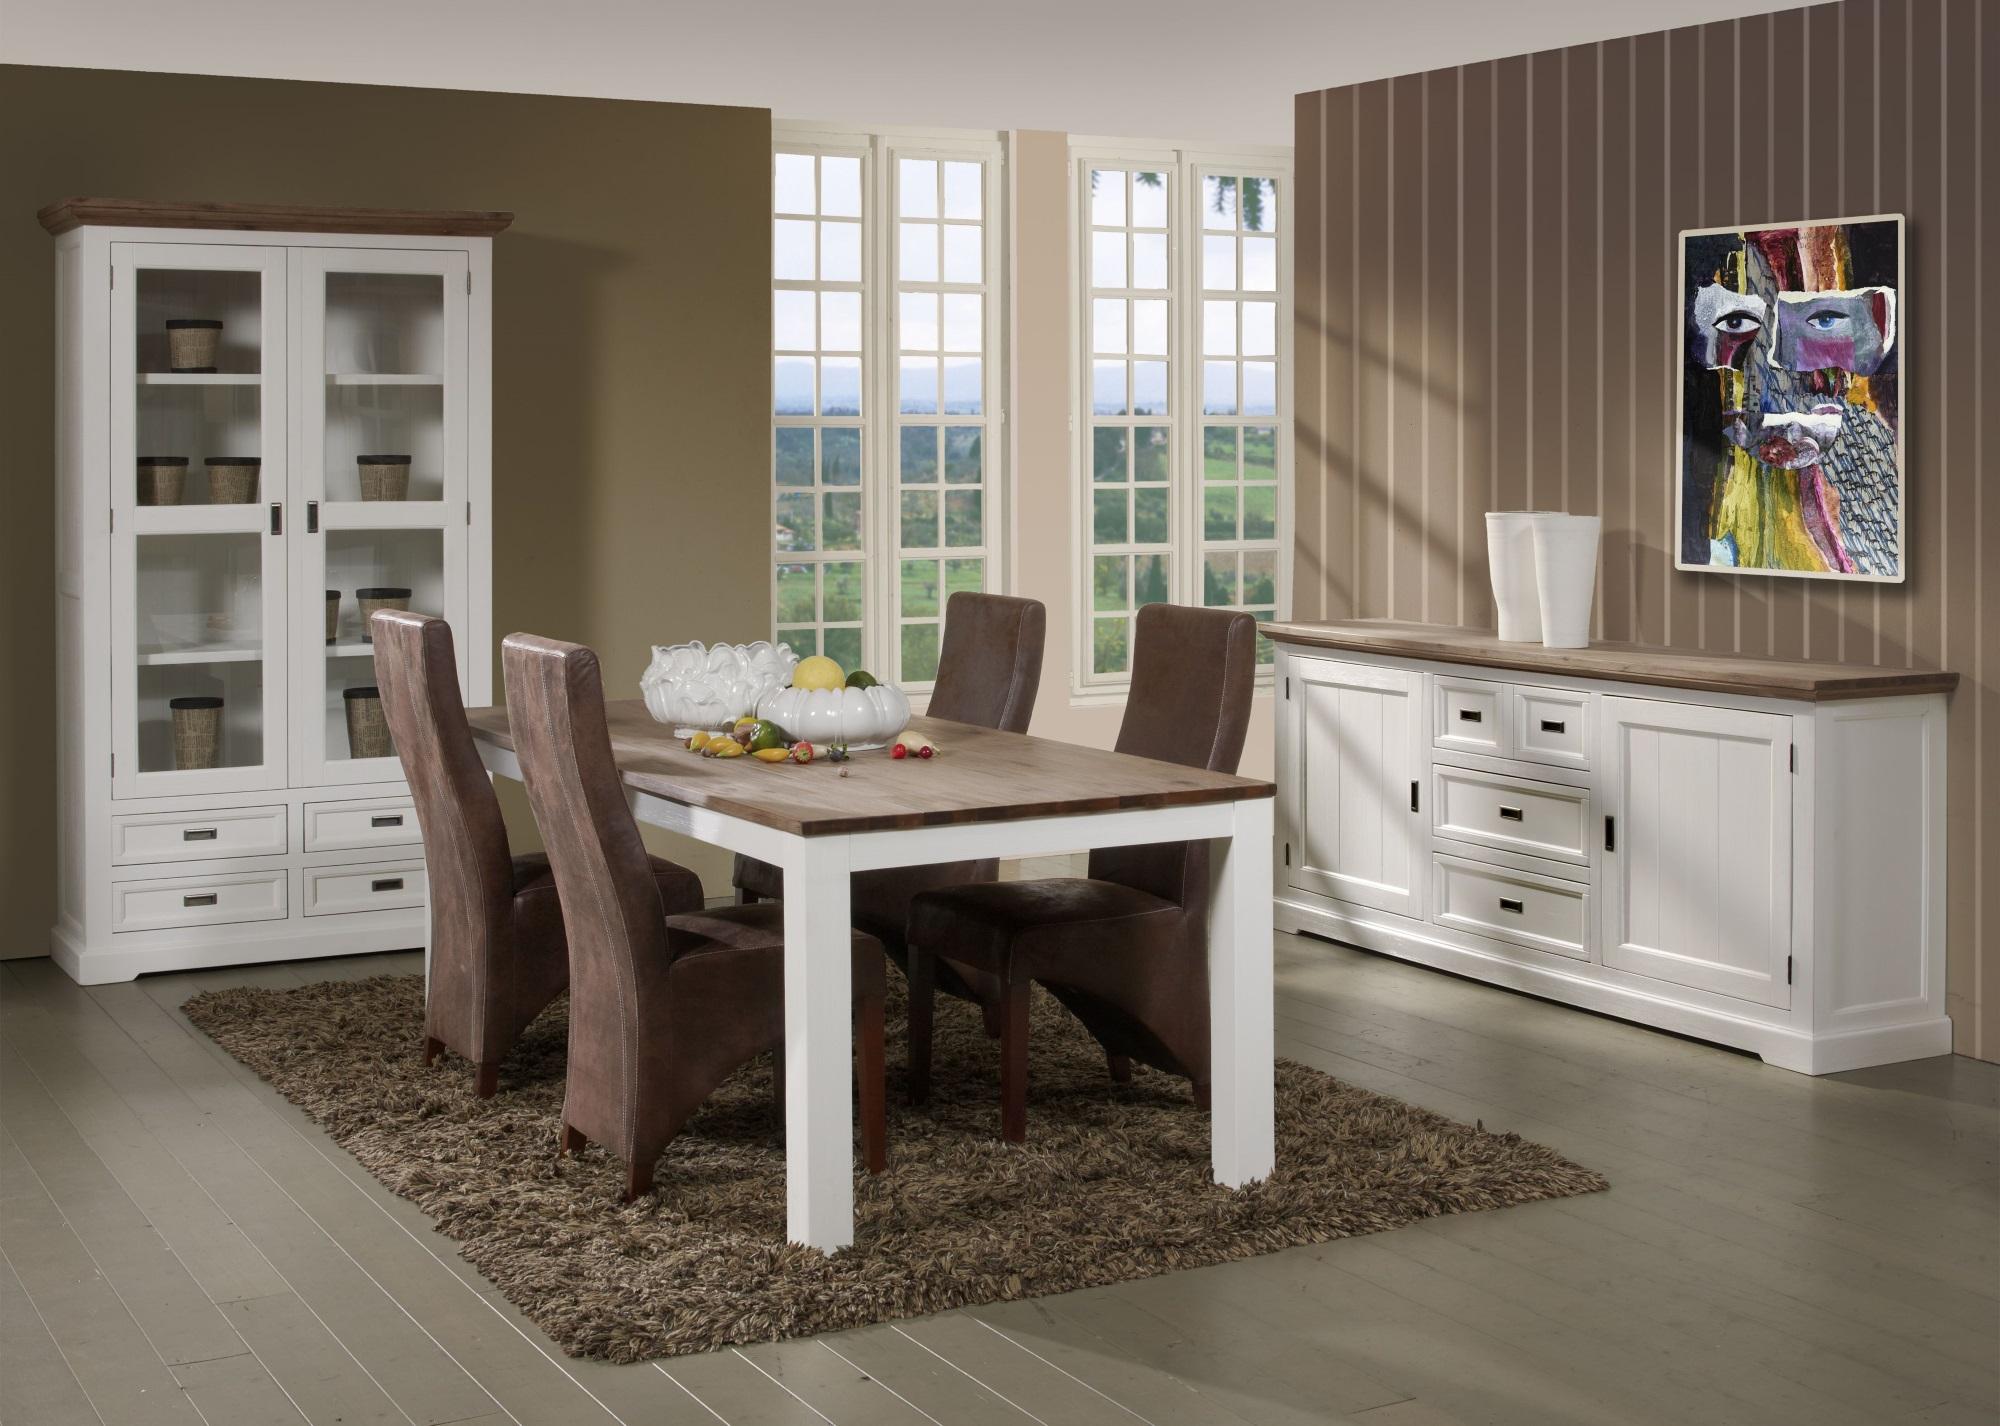 Salle à manger complète contemporaine coloris havana/blanc Kiaro II